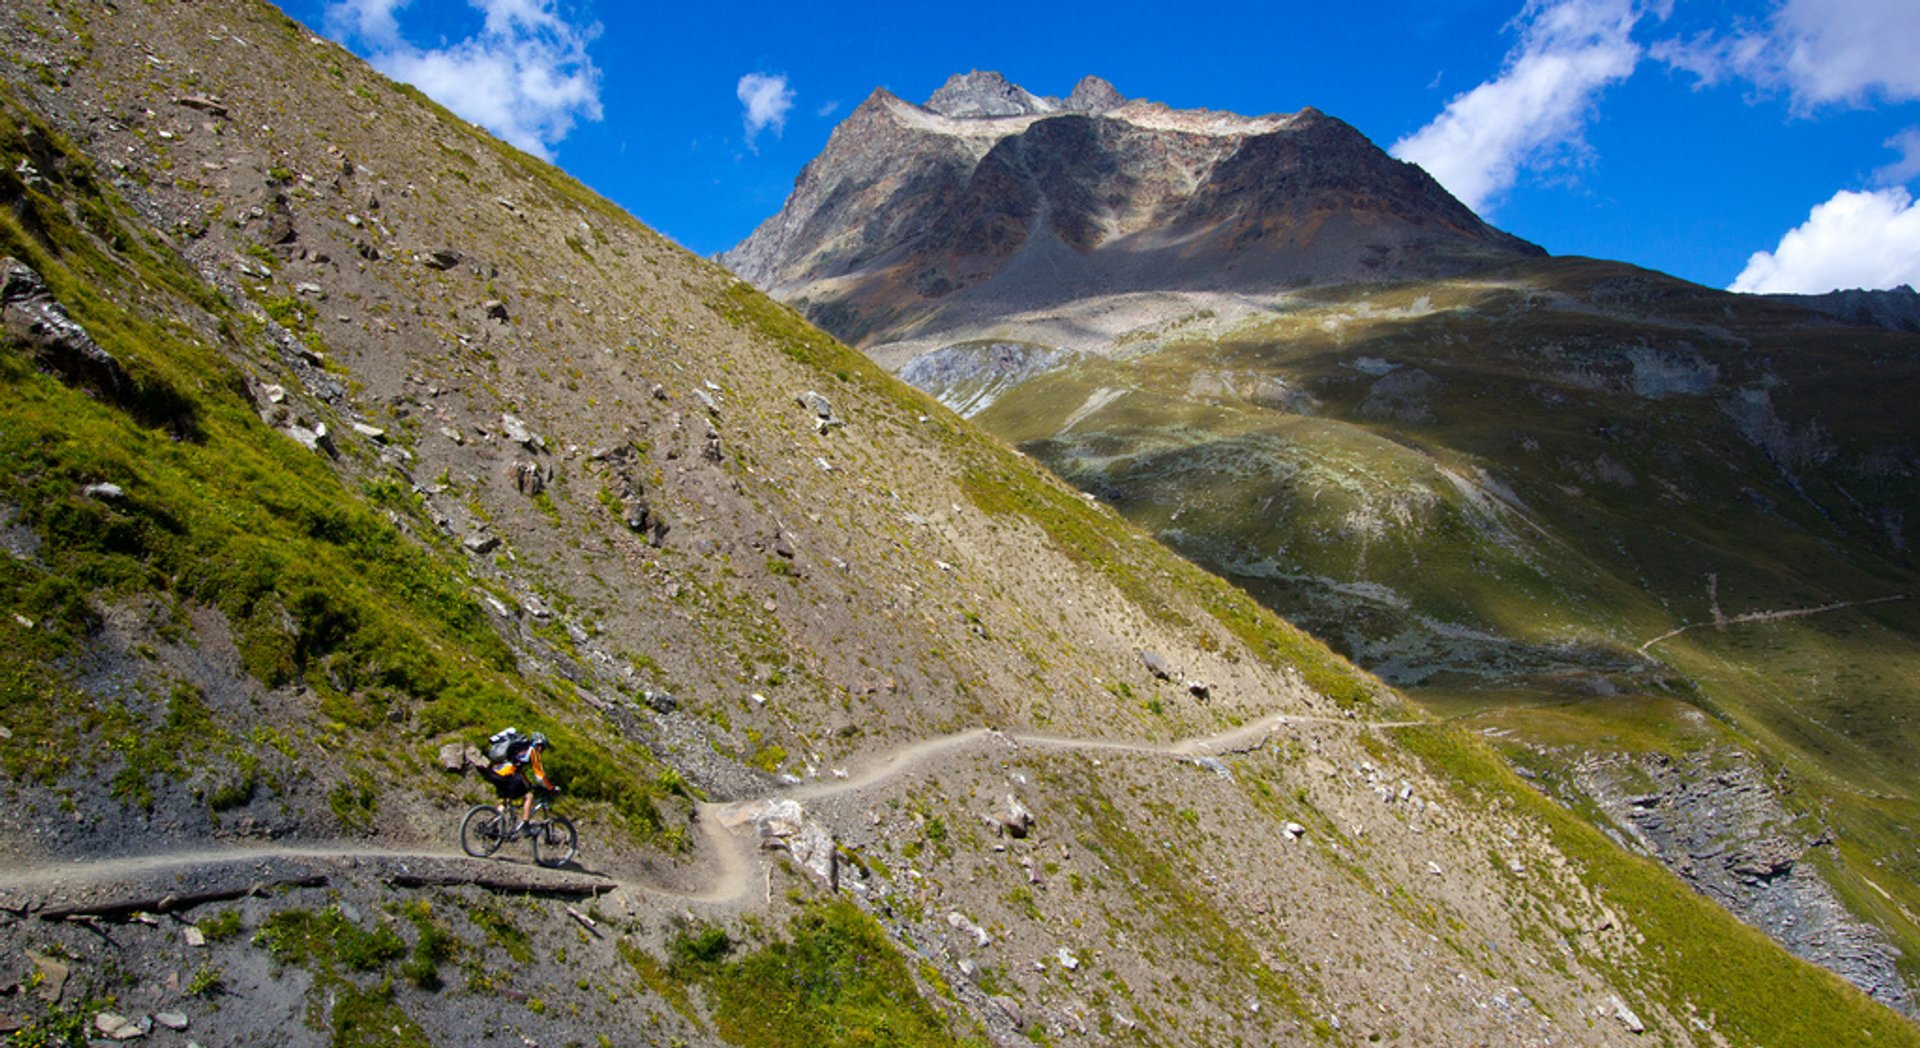 Singletrail, La Punt-Chamues-ch, Canton of Graubunden, Switzerland 2020